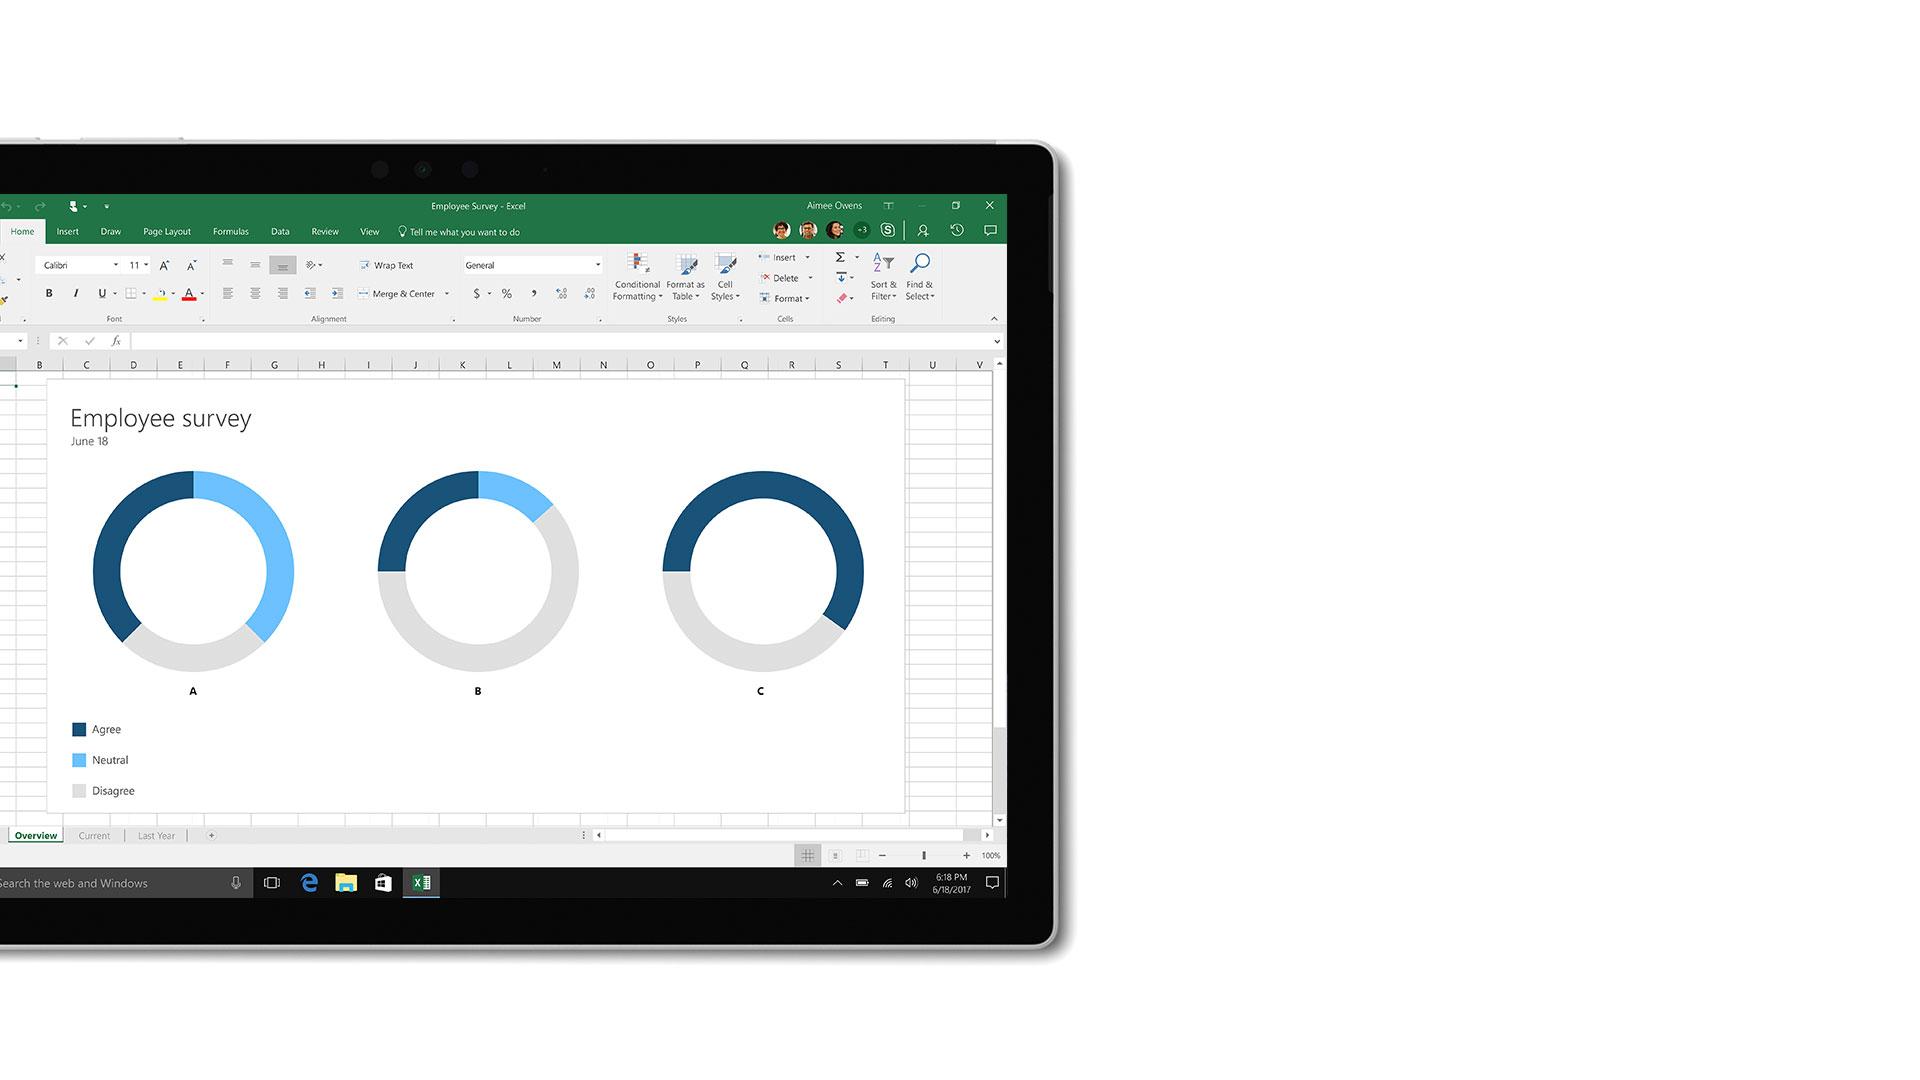 Afbeelding van gebruikersinterface van Microsoft Excel